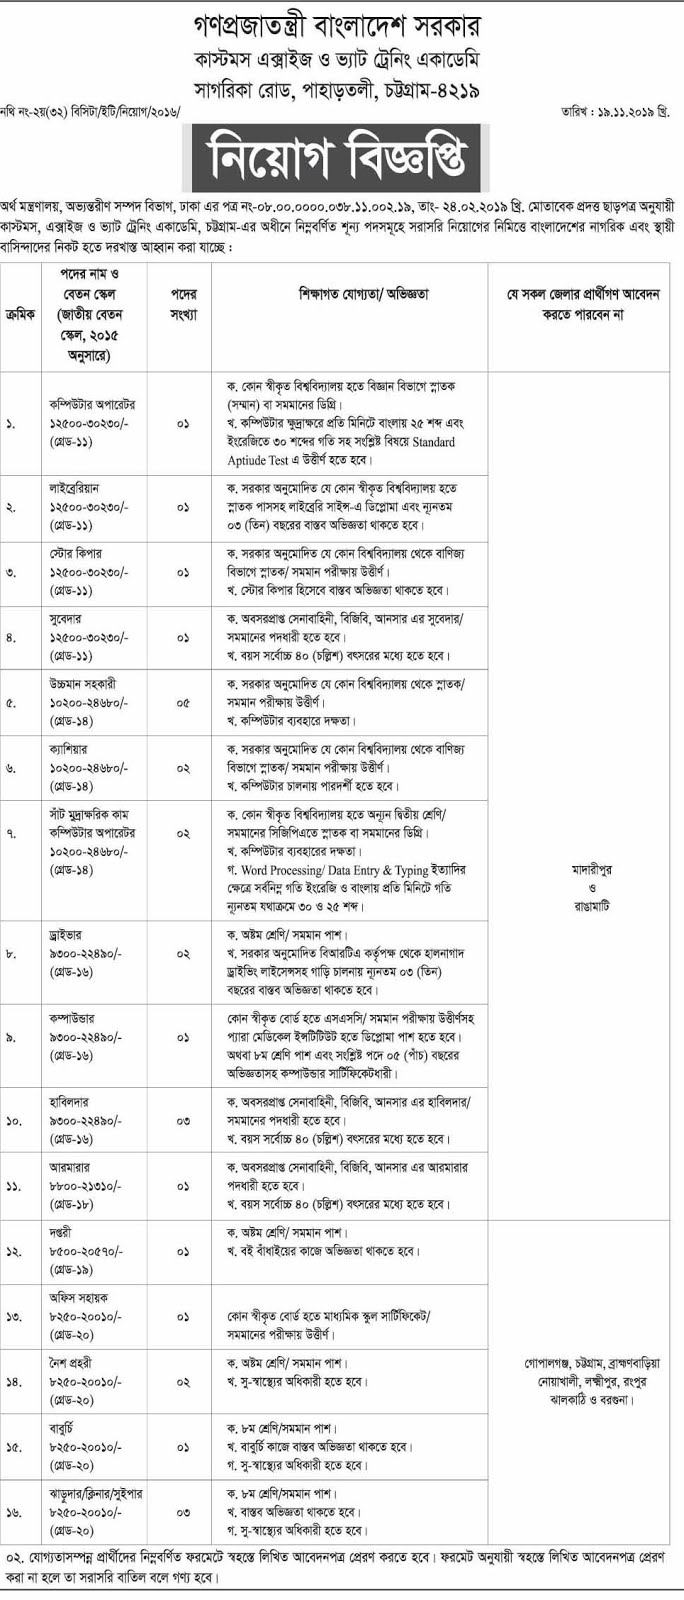 Bangladesh Customs, Excise & VAT Training Academy CEVTA Job Circular 2019